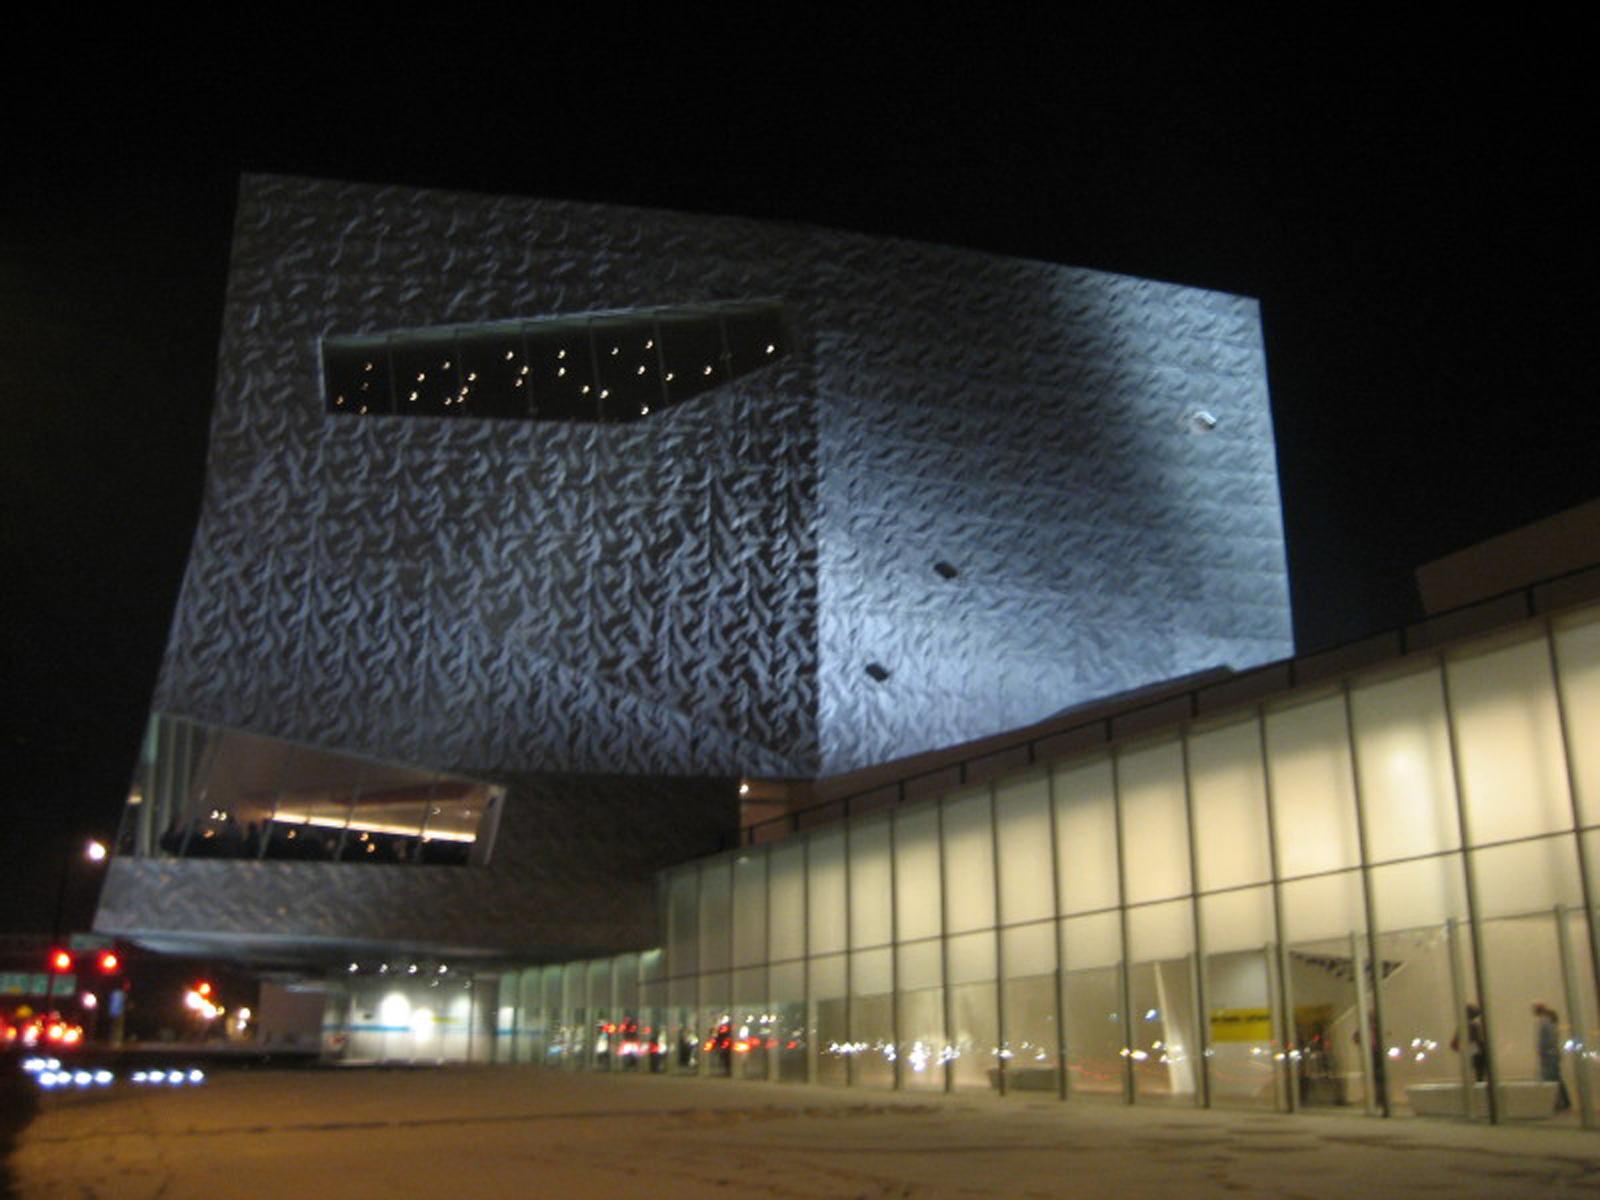 The Walker Art Center opened in 1971 in Minneapolis, Minnesota.